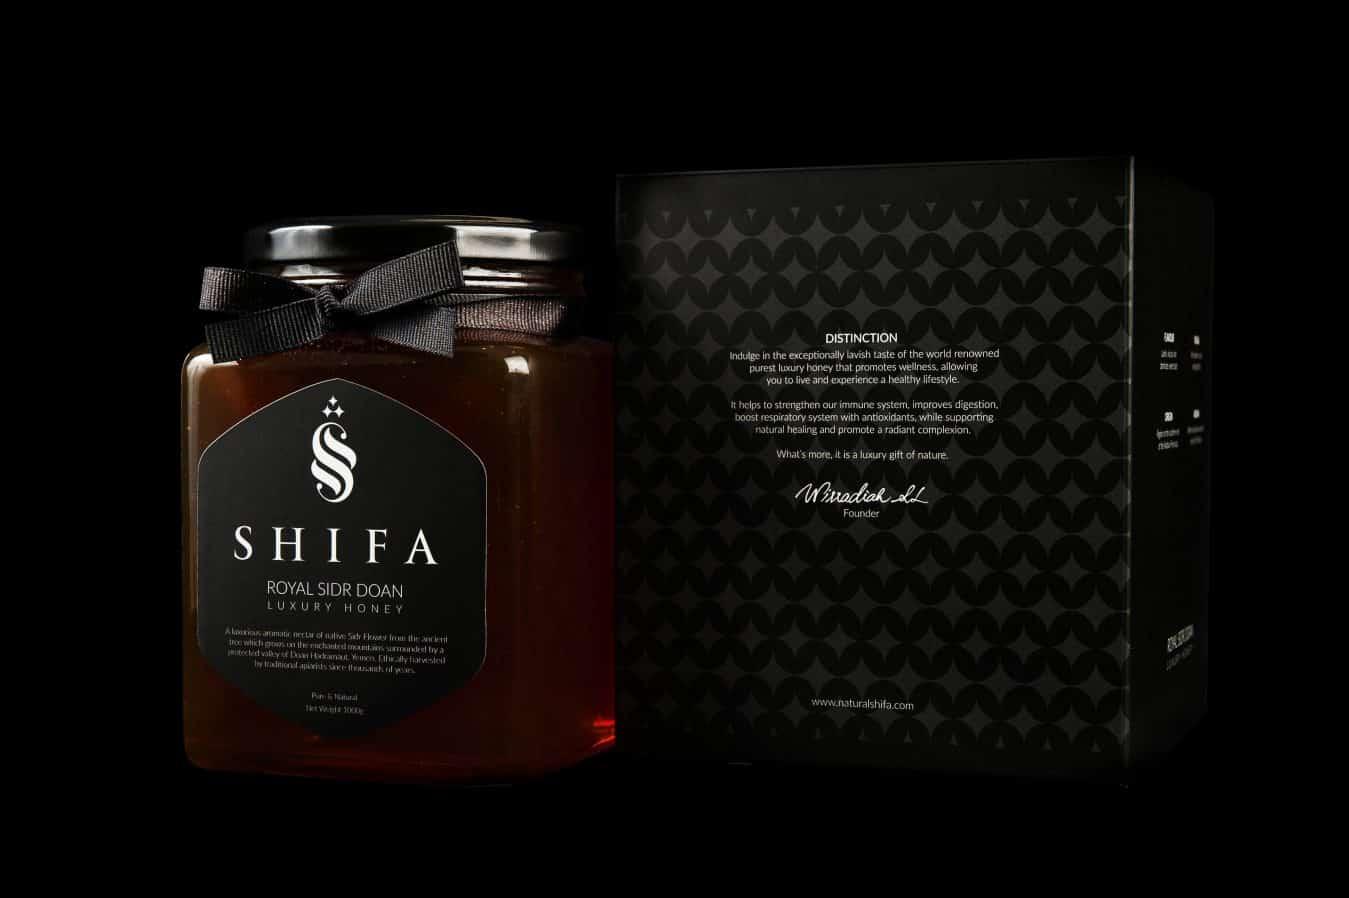 Shifa Royal Sidr Doan Honey - 5